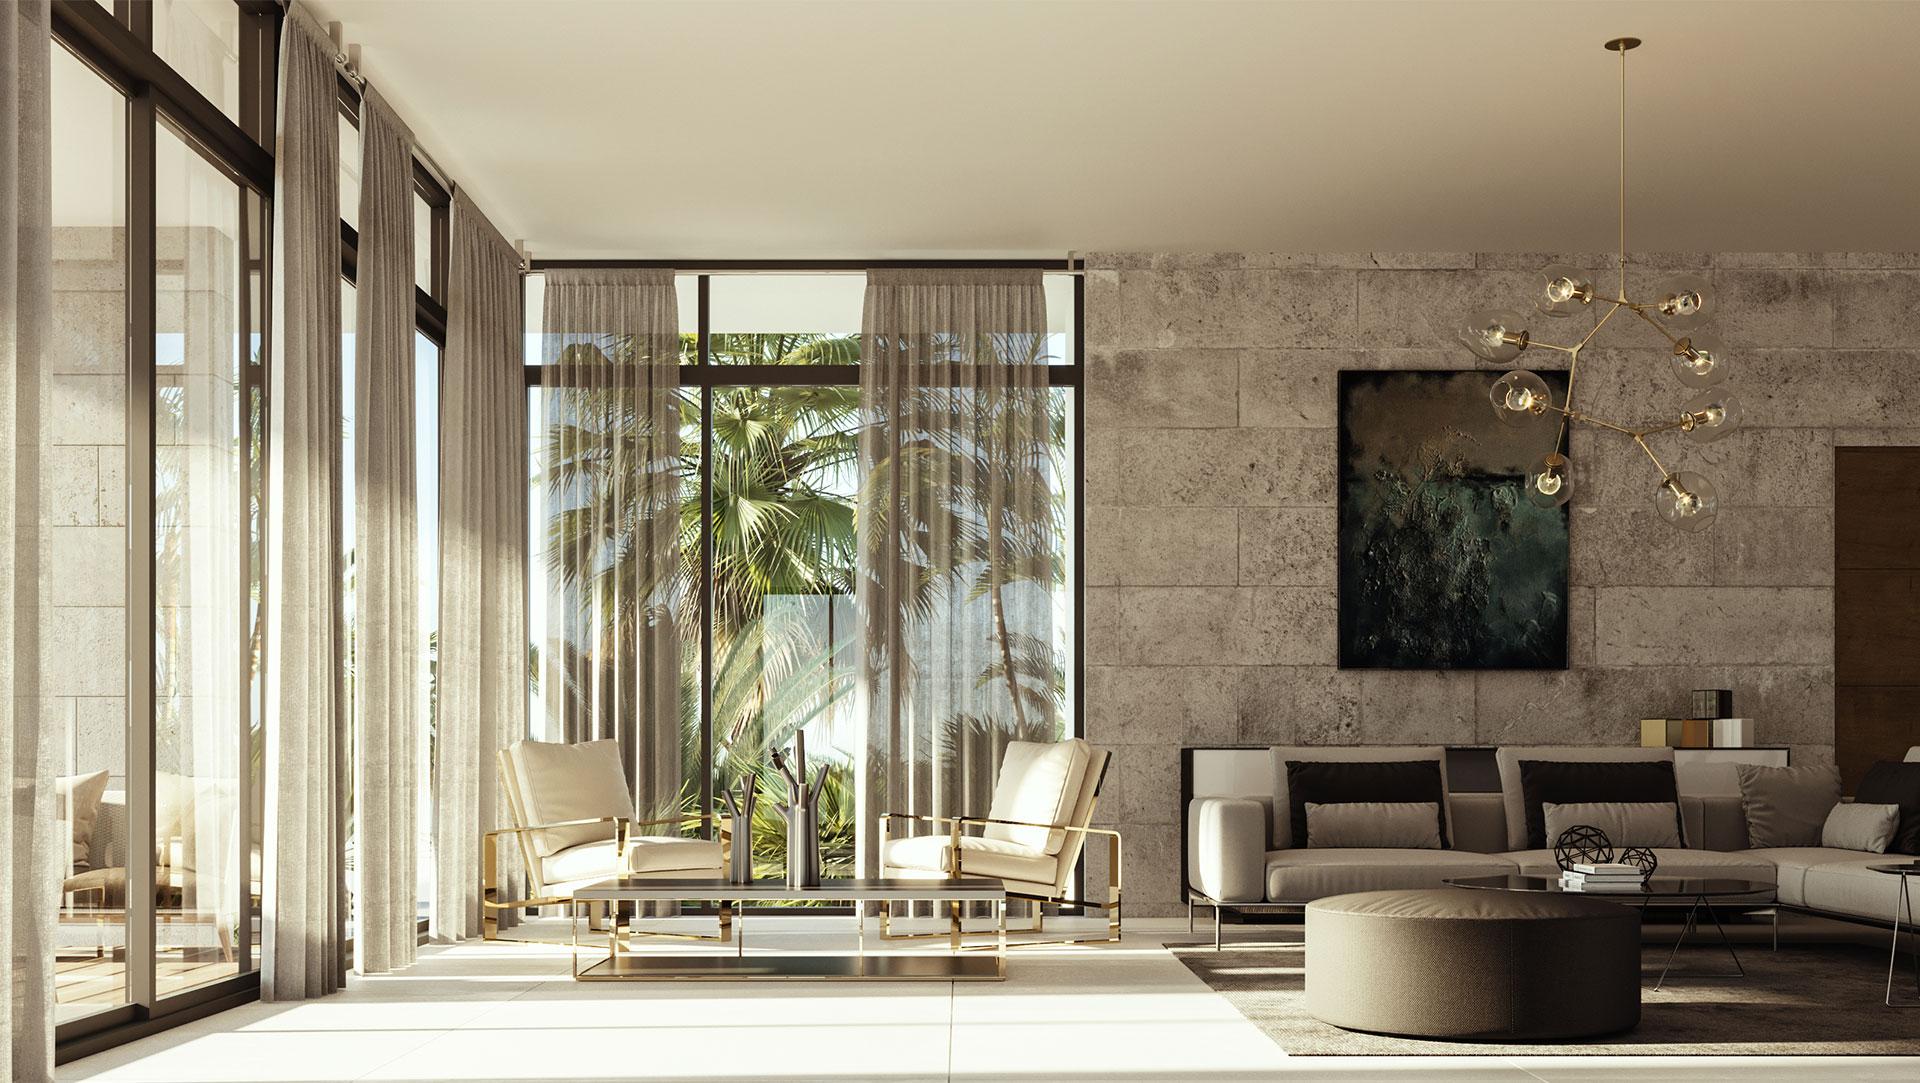 Interior Design project in 9961 Bay Harbor, Florida